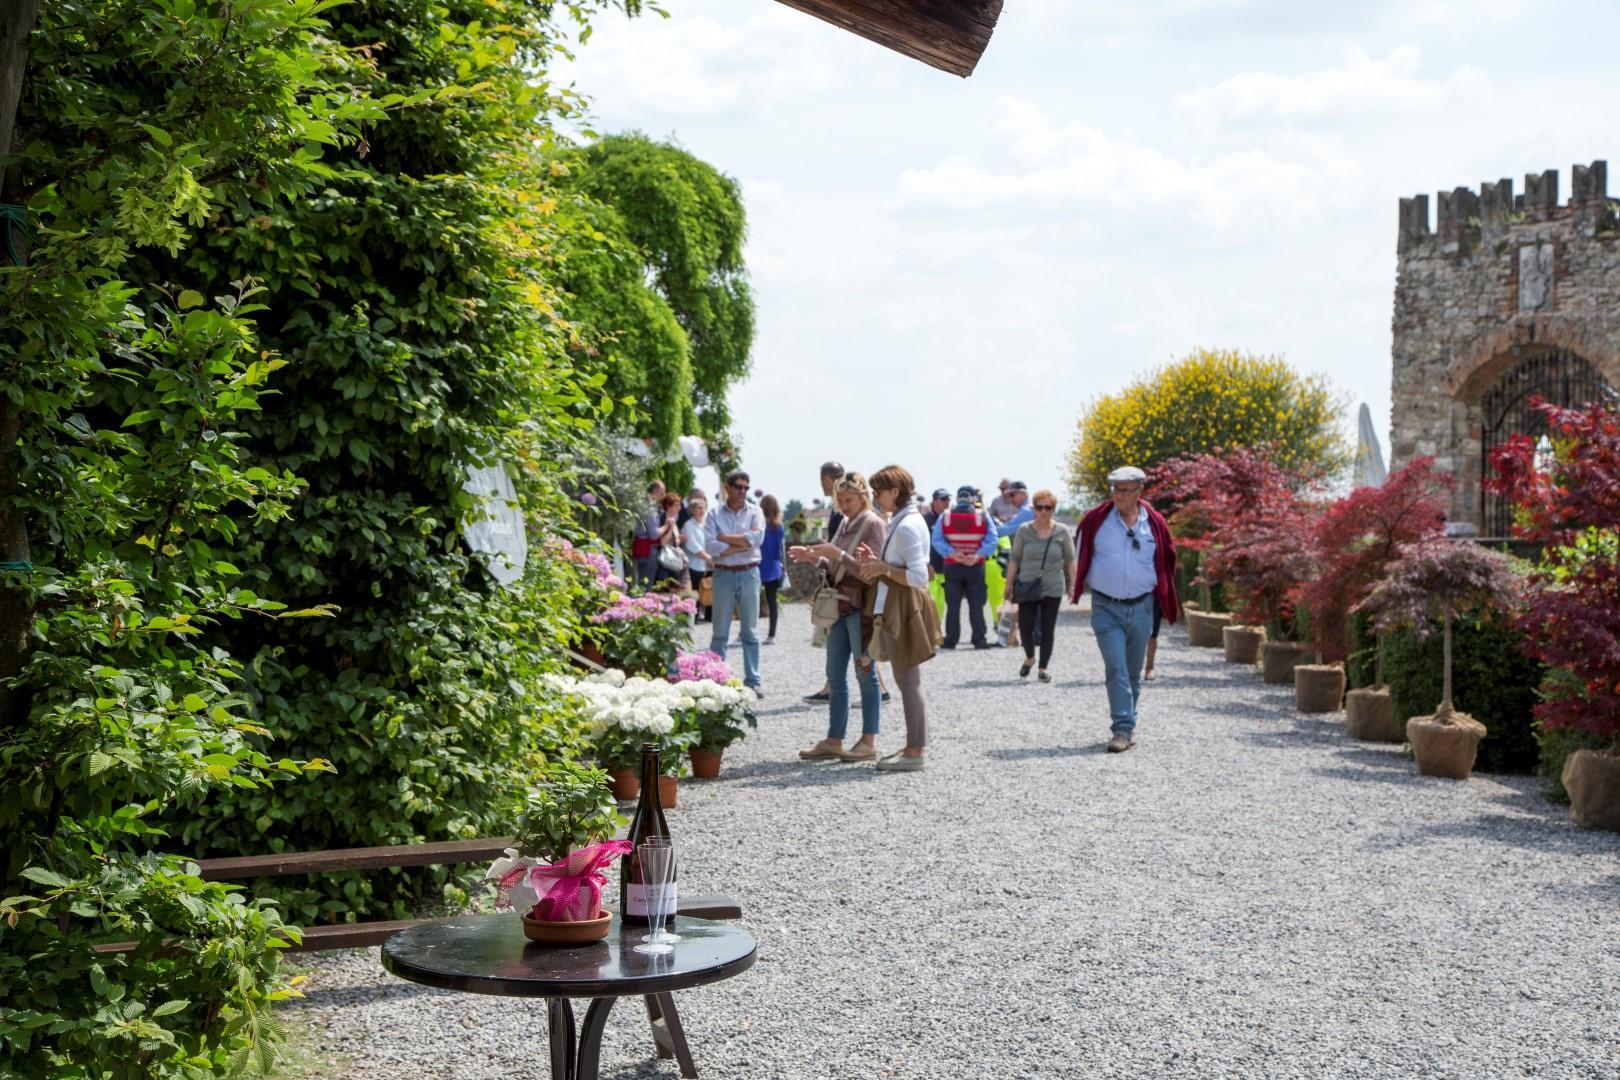 Franciacorta in Fiore: vent anni di successi